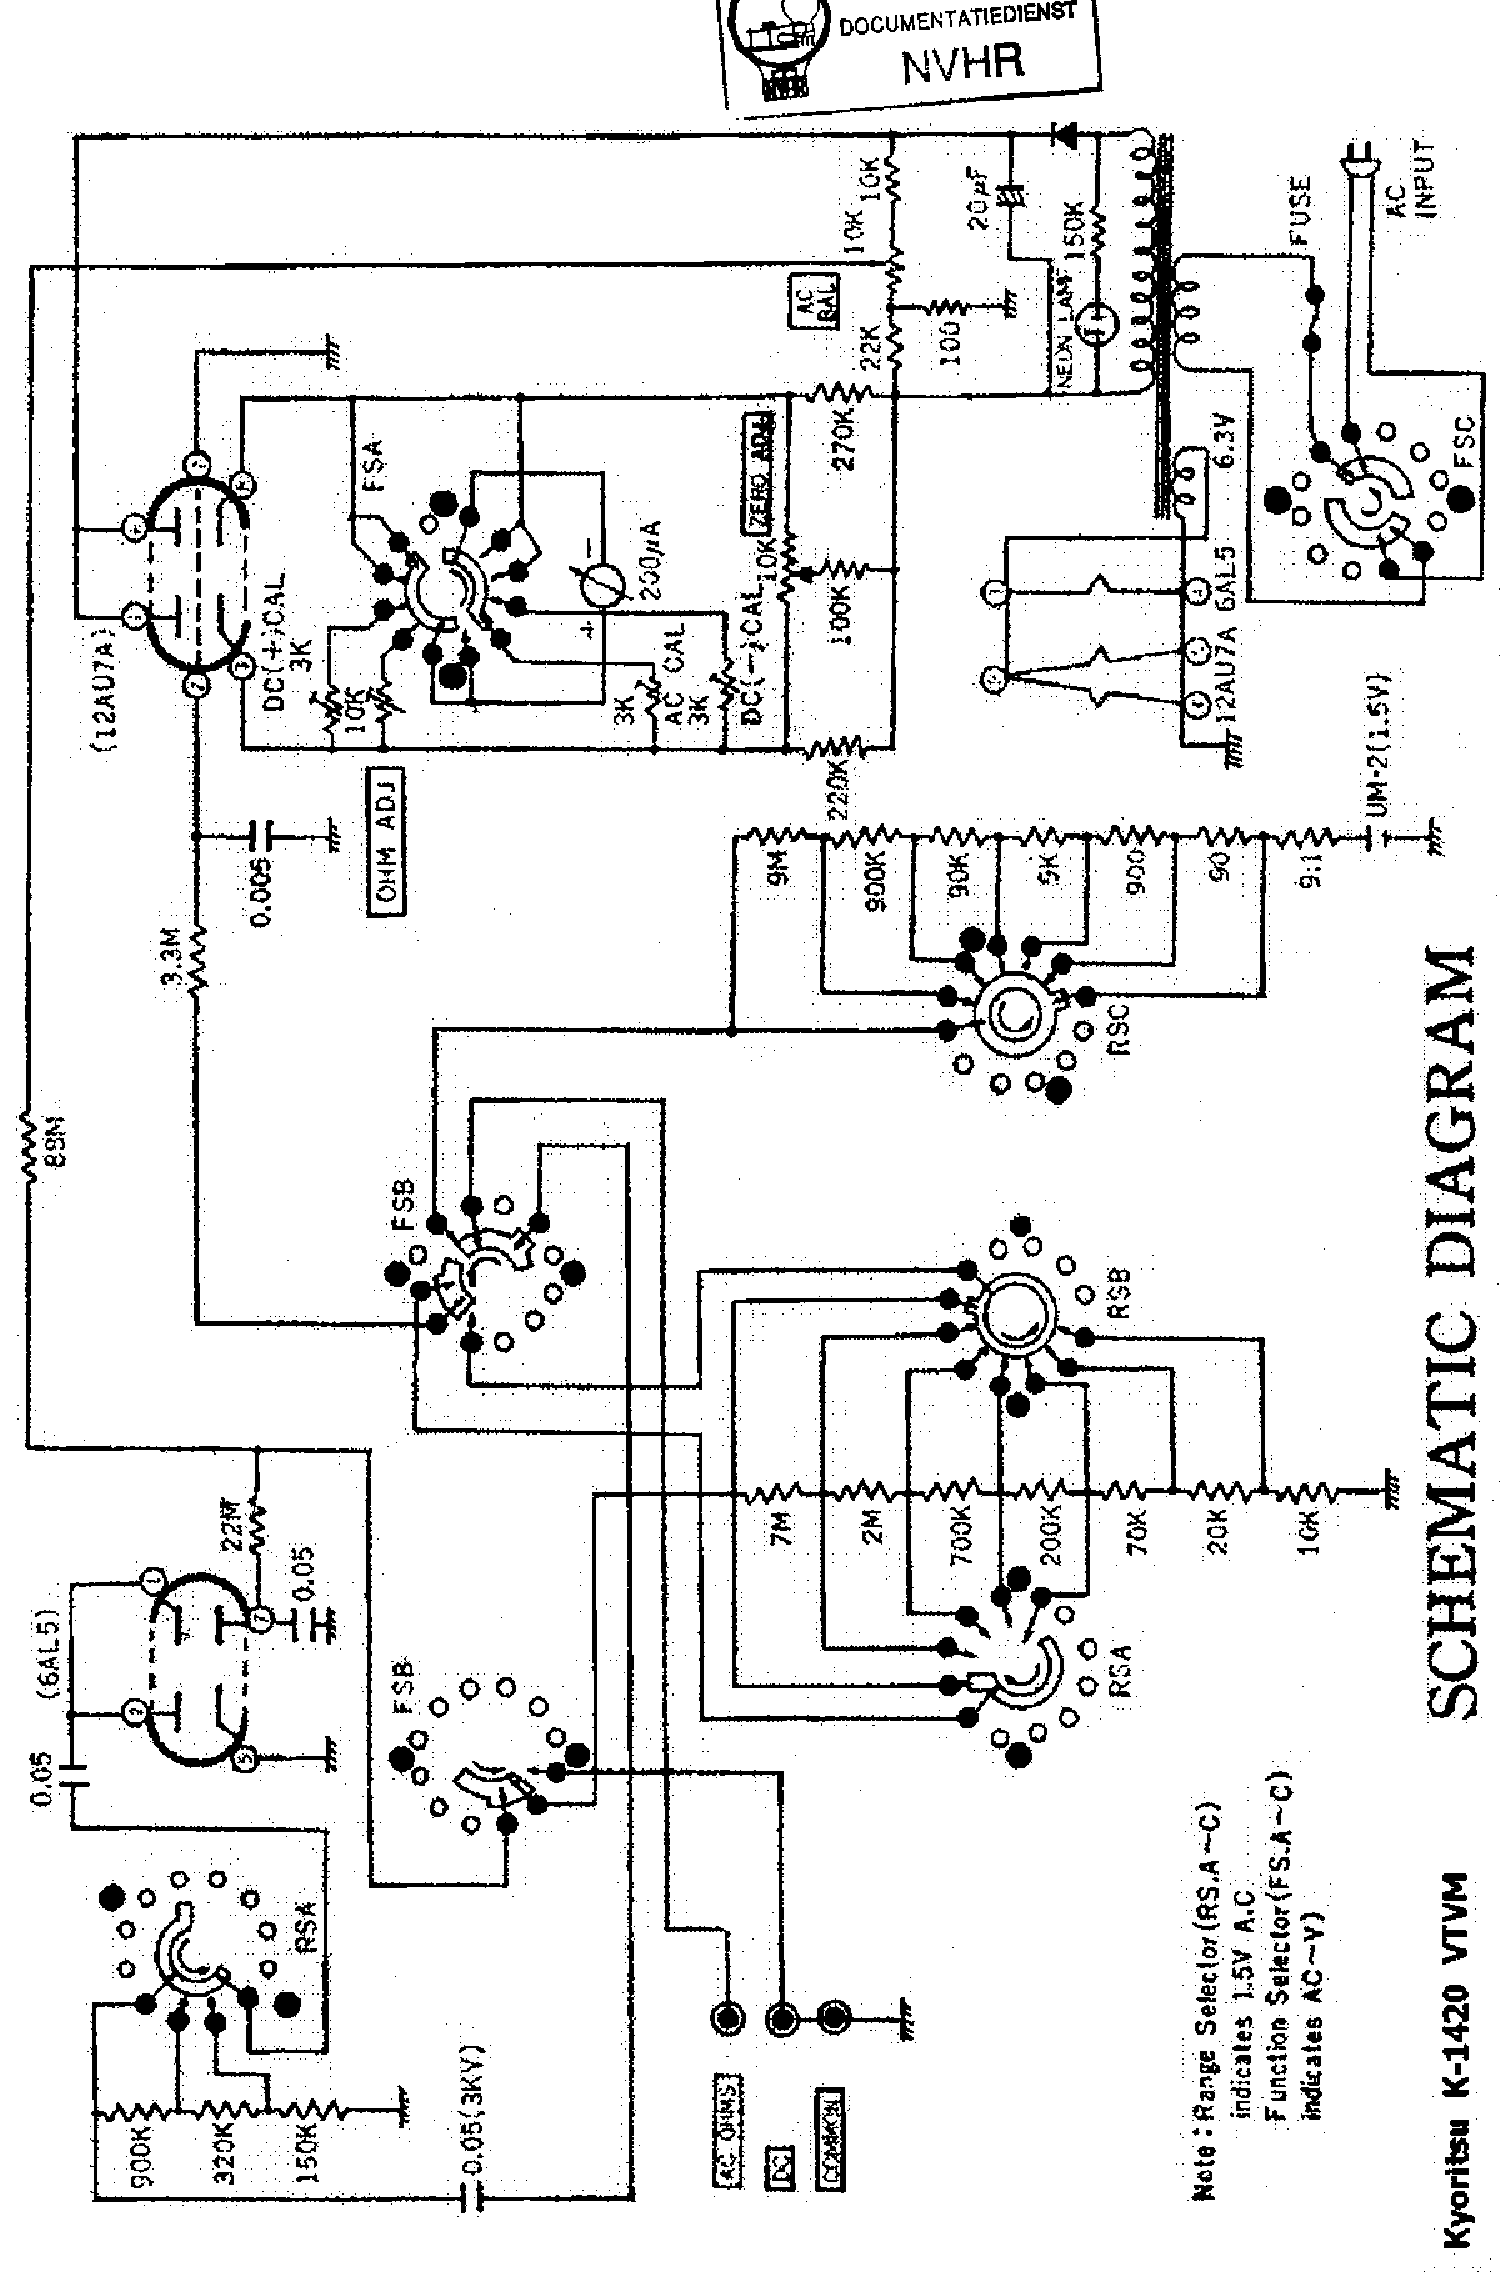 Kyoritsu K1420 Tube Volt Meter Sch Service Manual 1st Page: Voltmeter Gauge Wiring Diagram Sel At Chusao.net